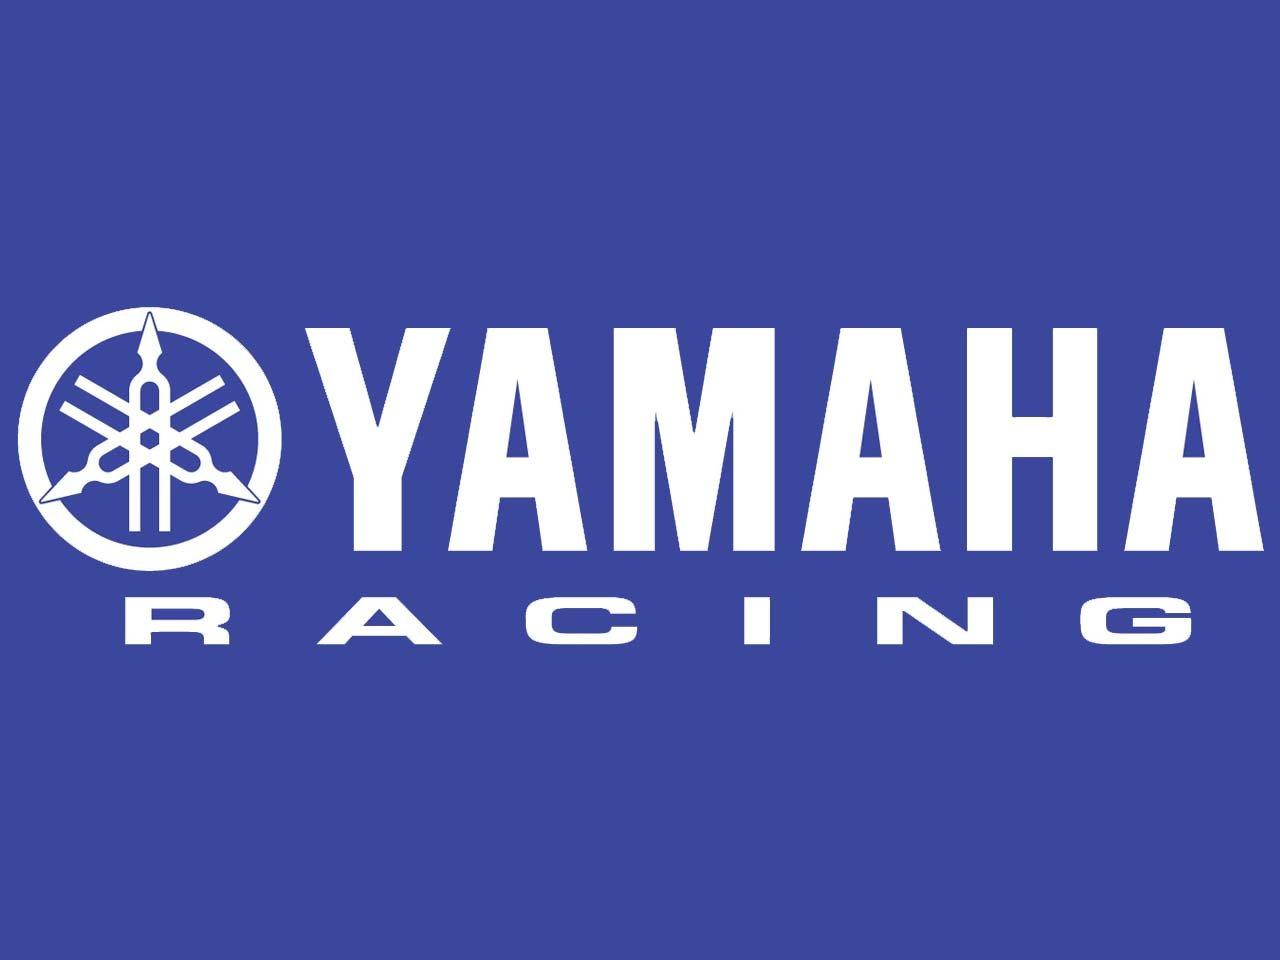 Yamaha Logo 7163 Hd Wallpapers in Logos   Imagescicom 1280x960